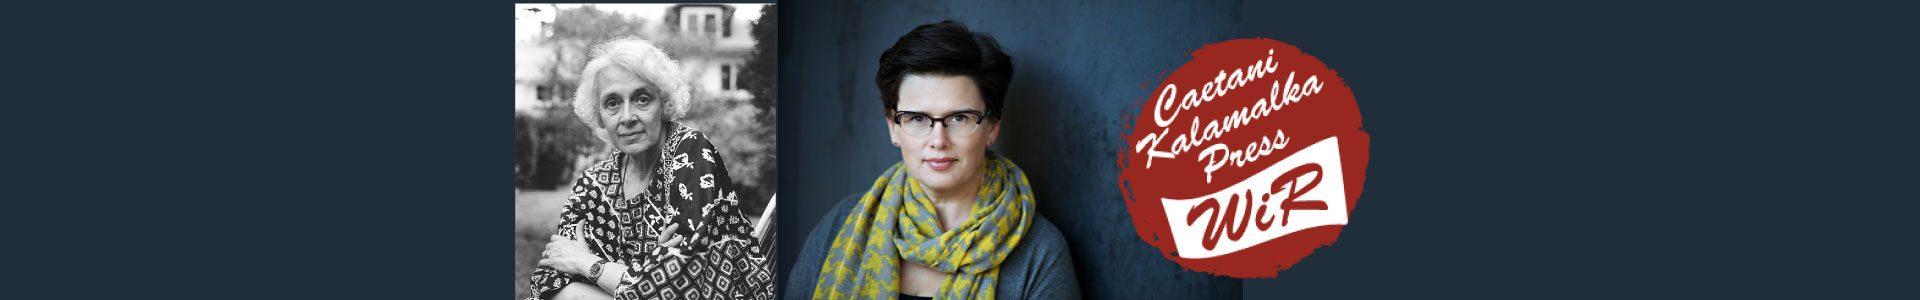 Janet Munsil, Caetani Stores